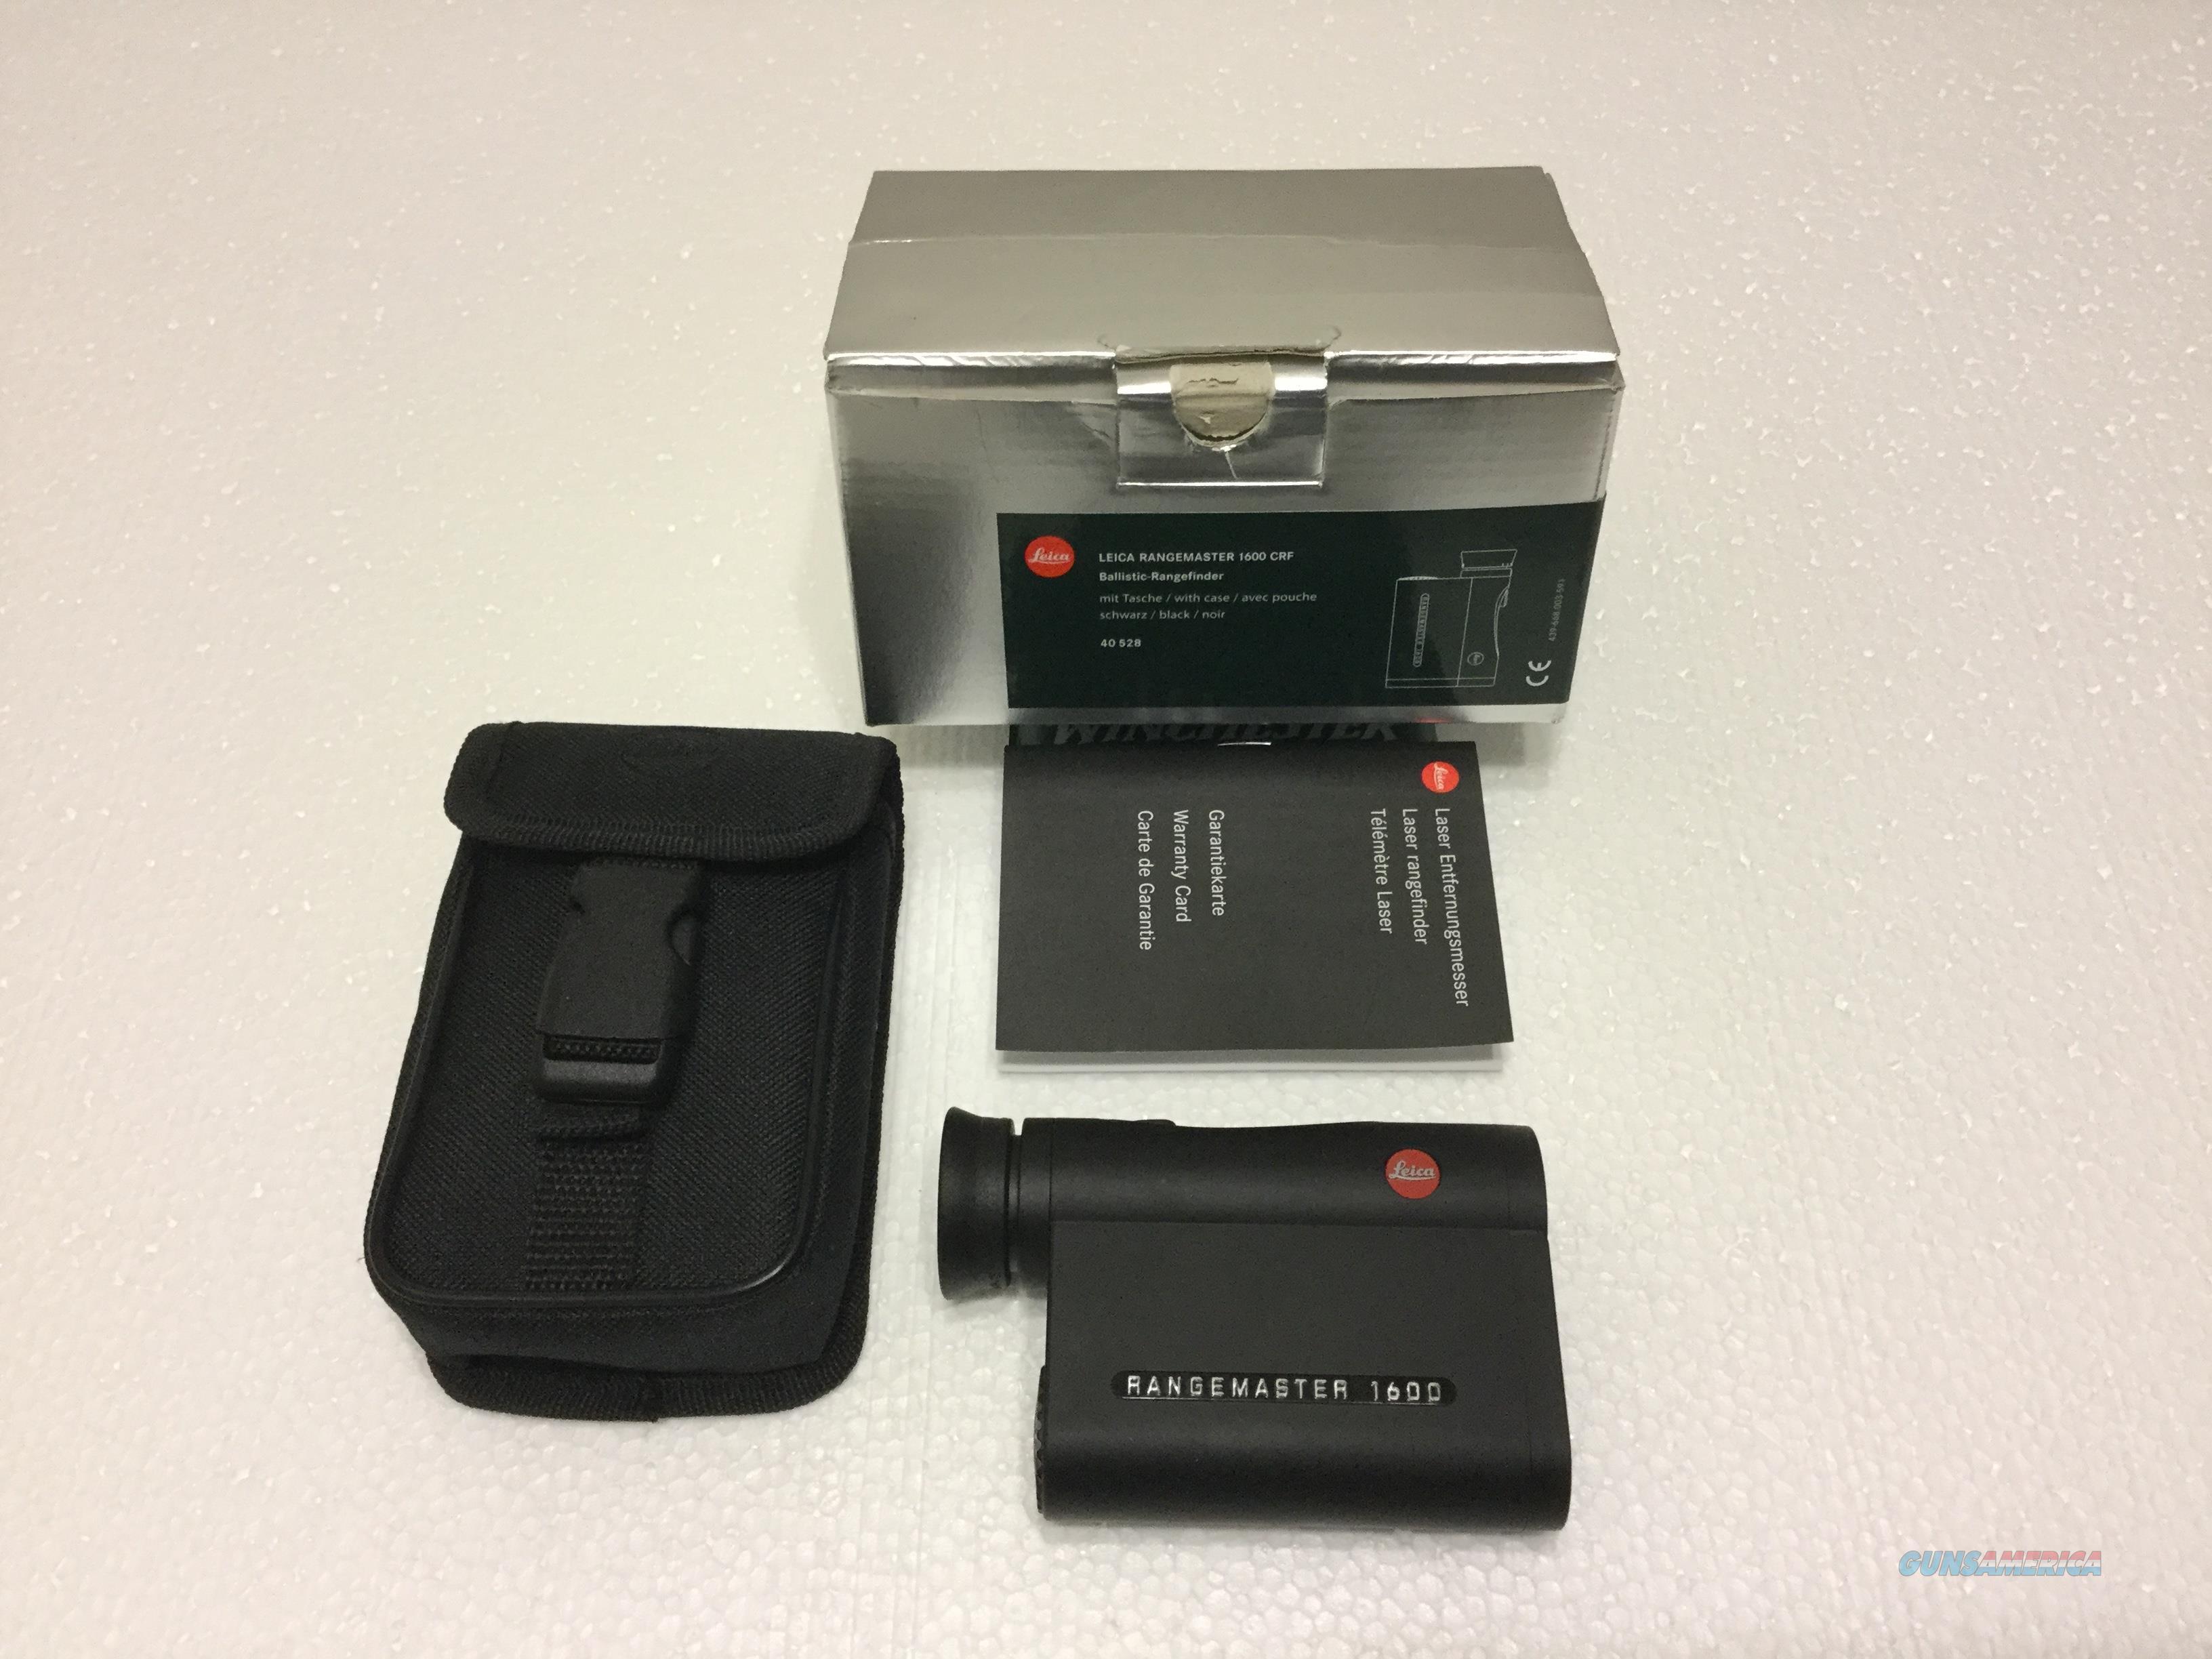 Leica Entfernungsmesser Crf 1600 : Leica u crangemaster d cfr ballistic range f for sale